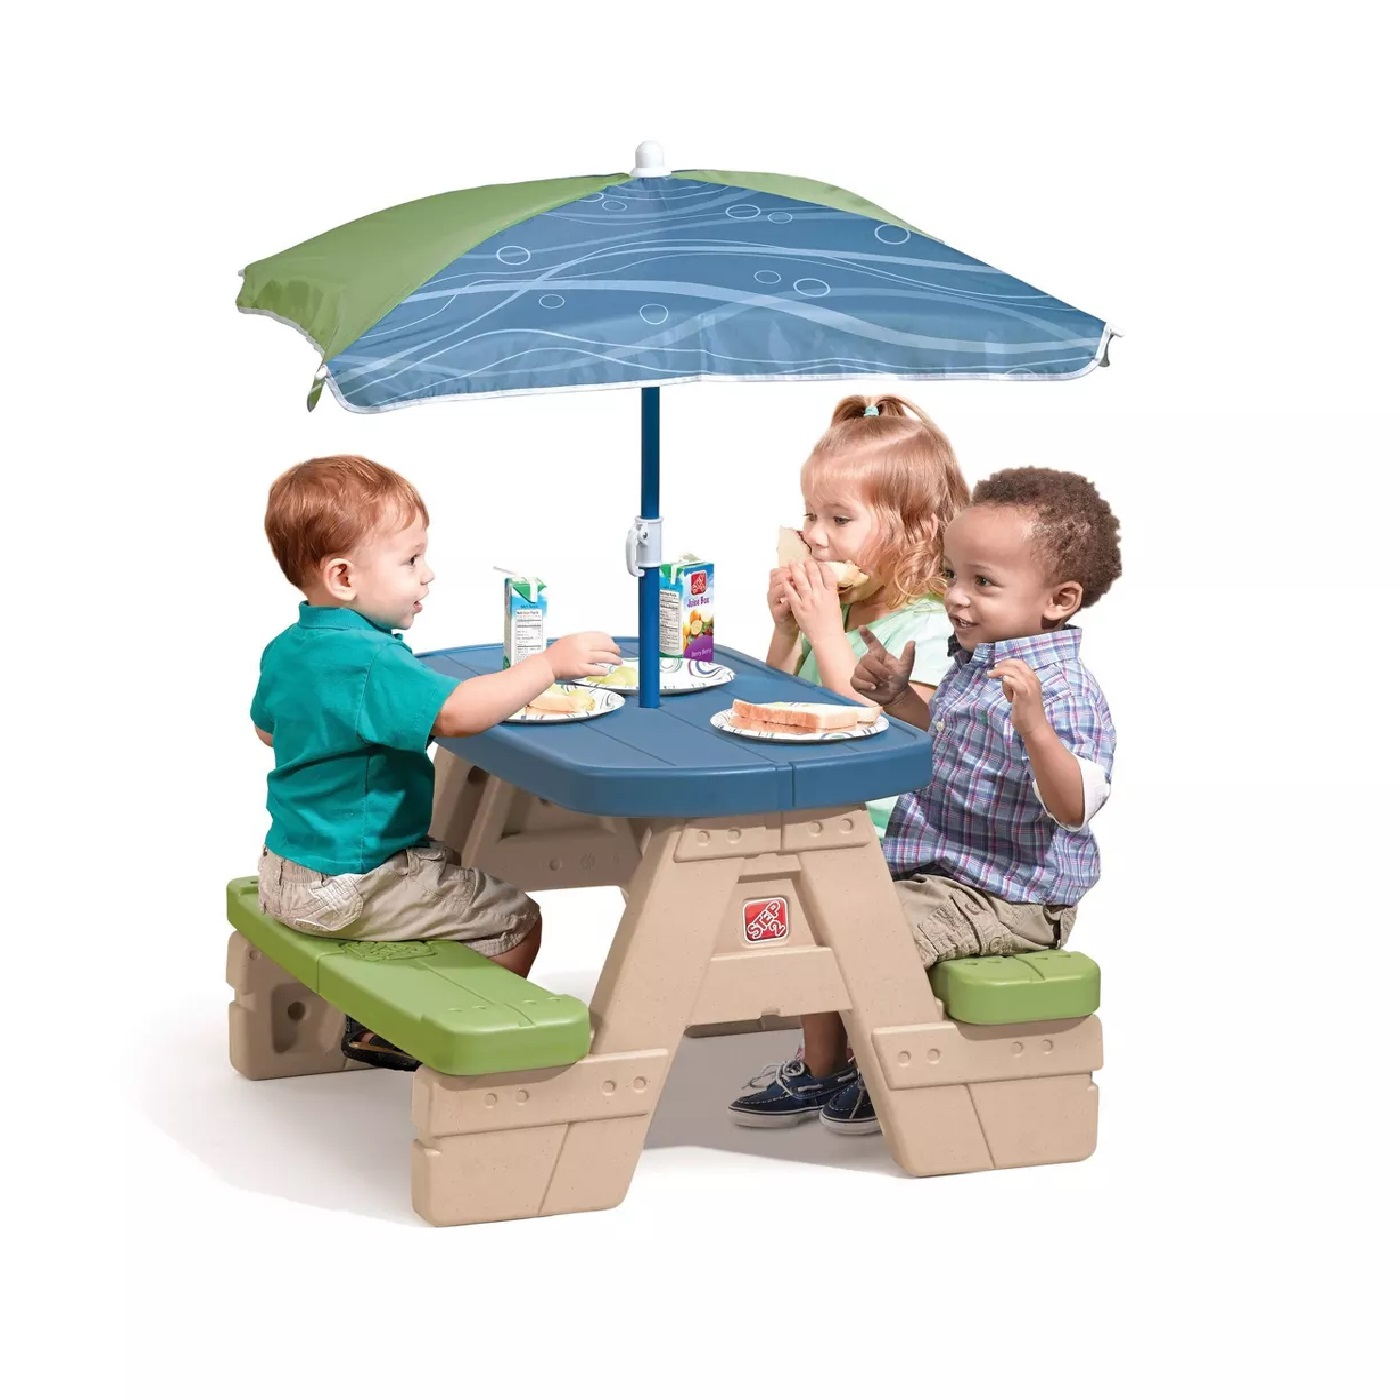 play furniture & toy storage image